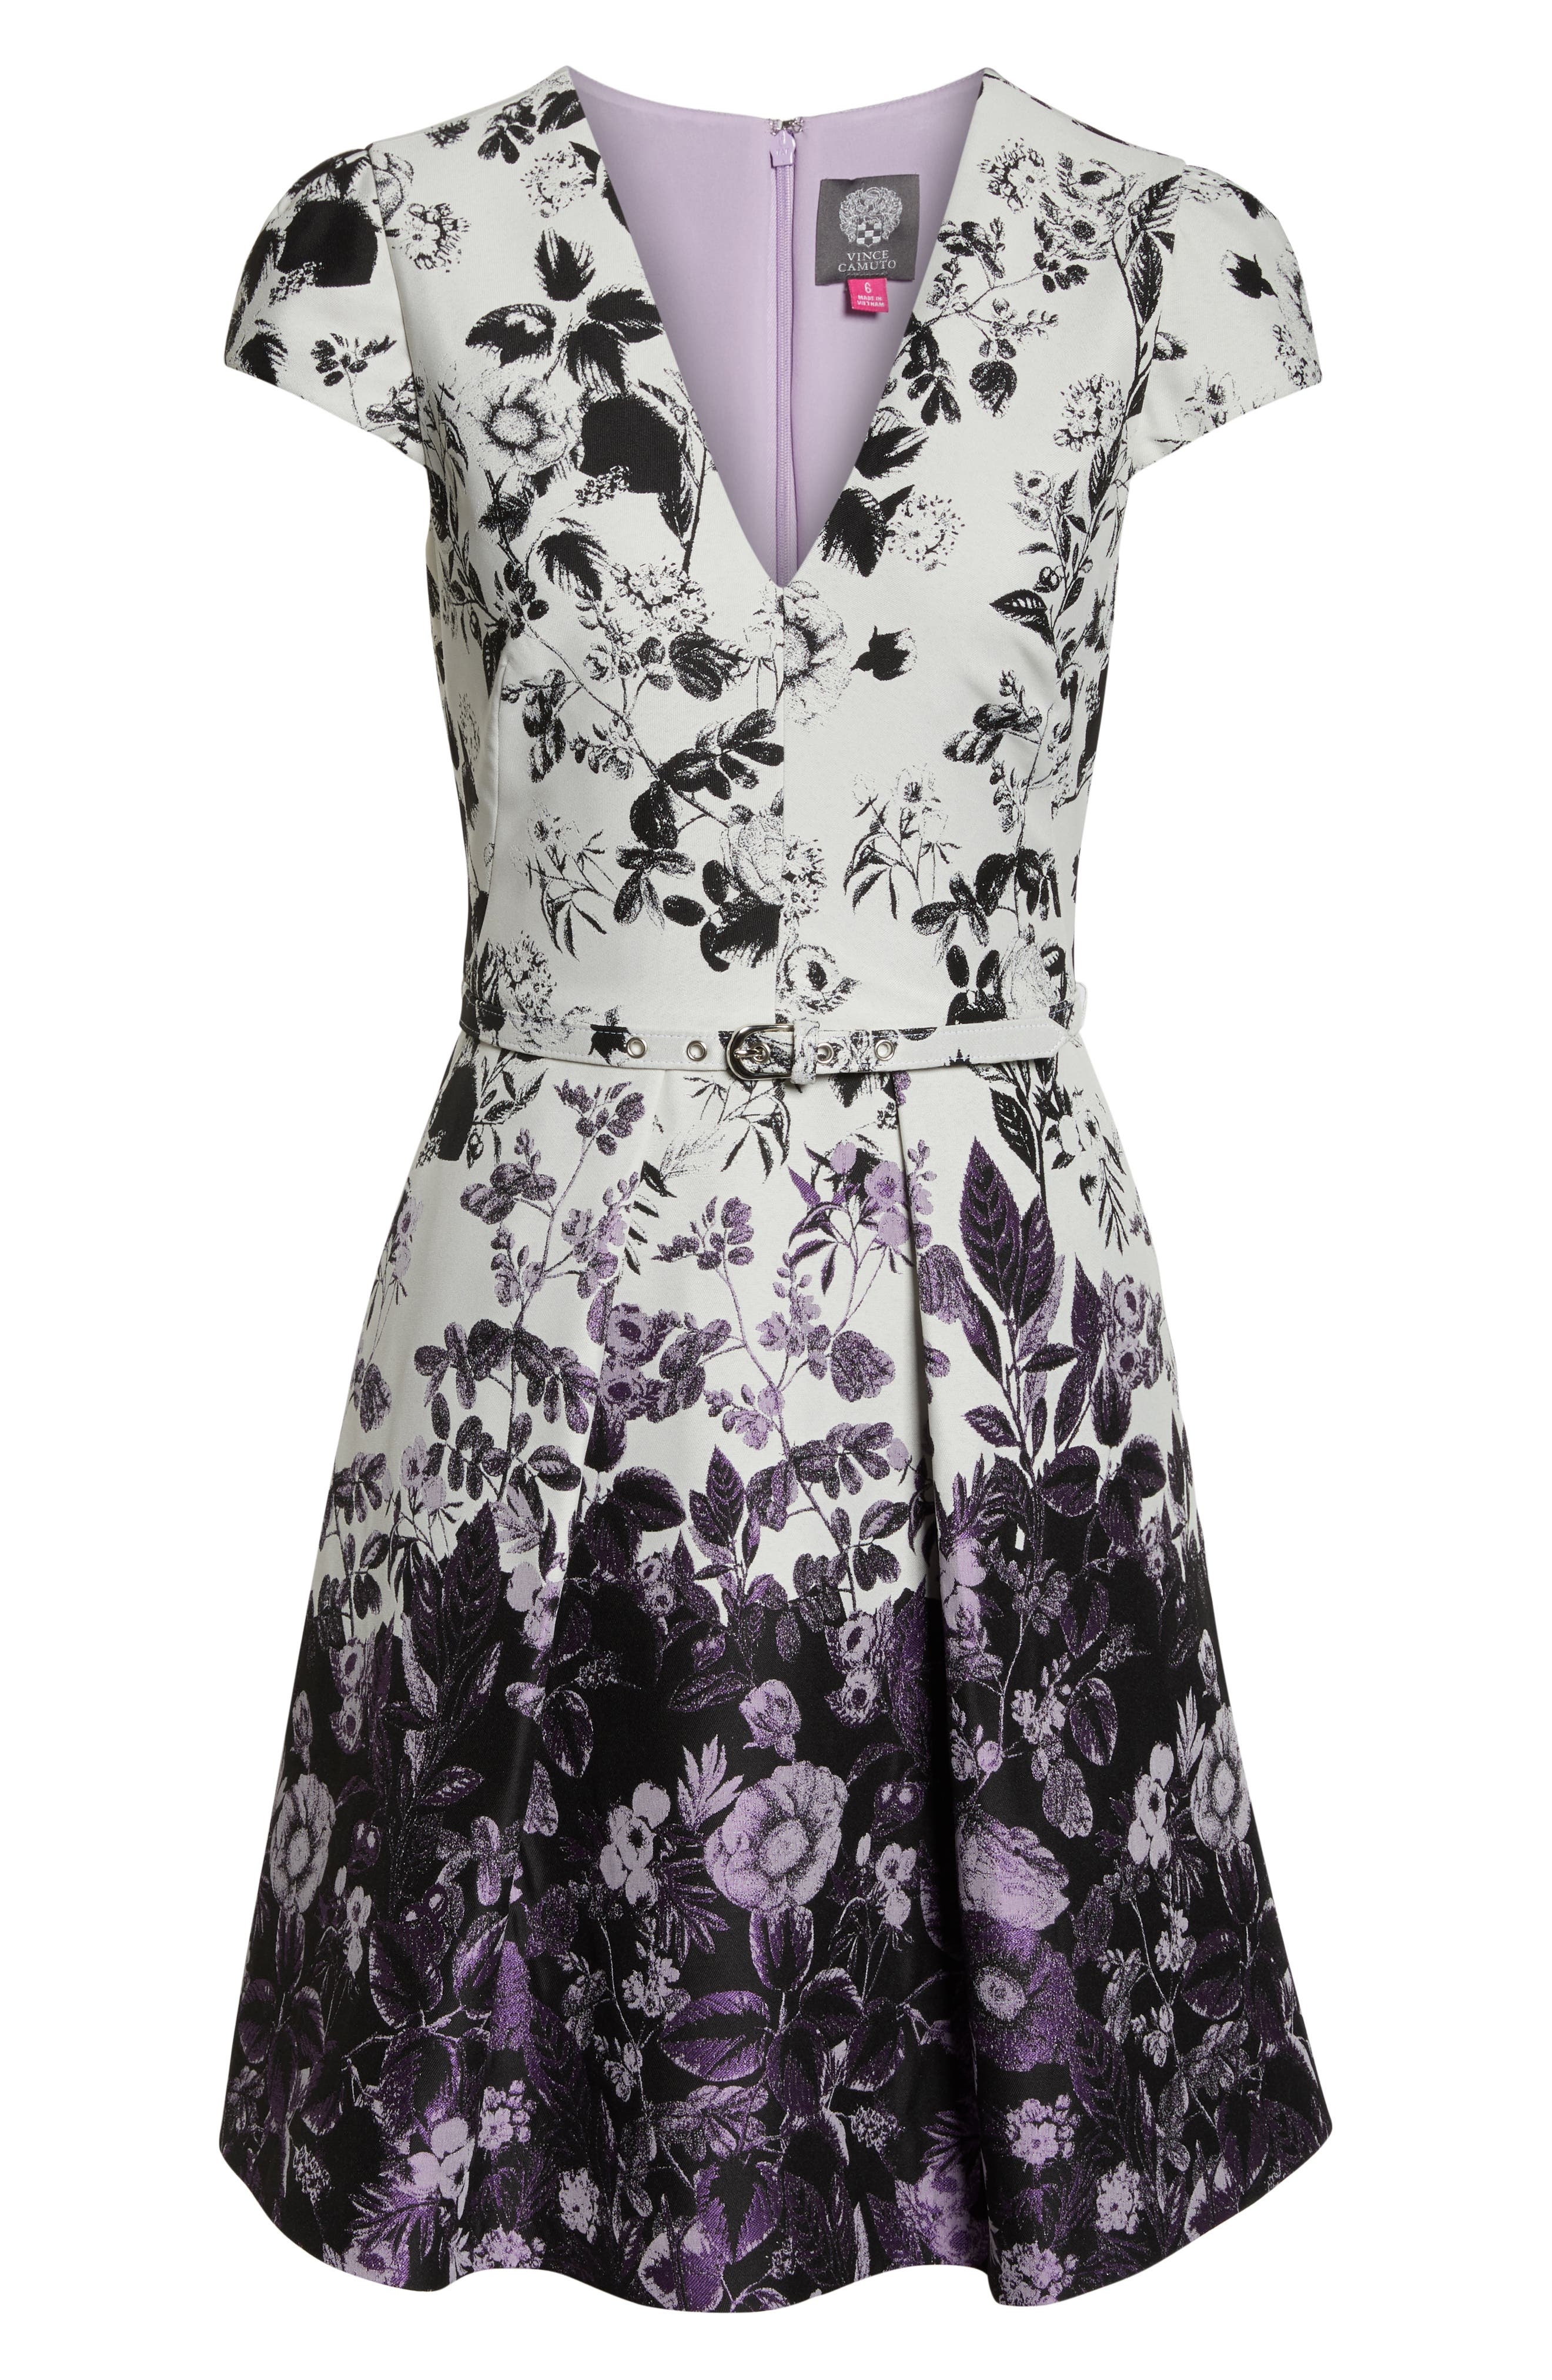 VINCE CAMUTO, Floral Jacquard Fit and Flare Dress, Alternate thumbnail 7, color, PURPLE MULTI